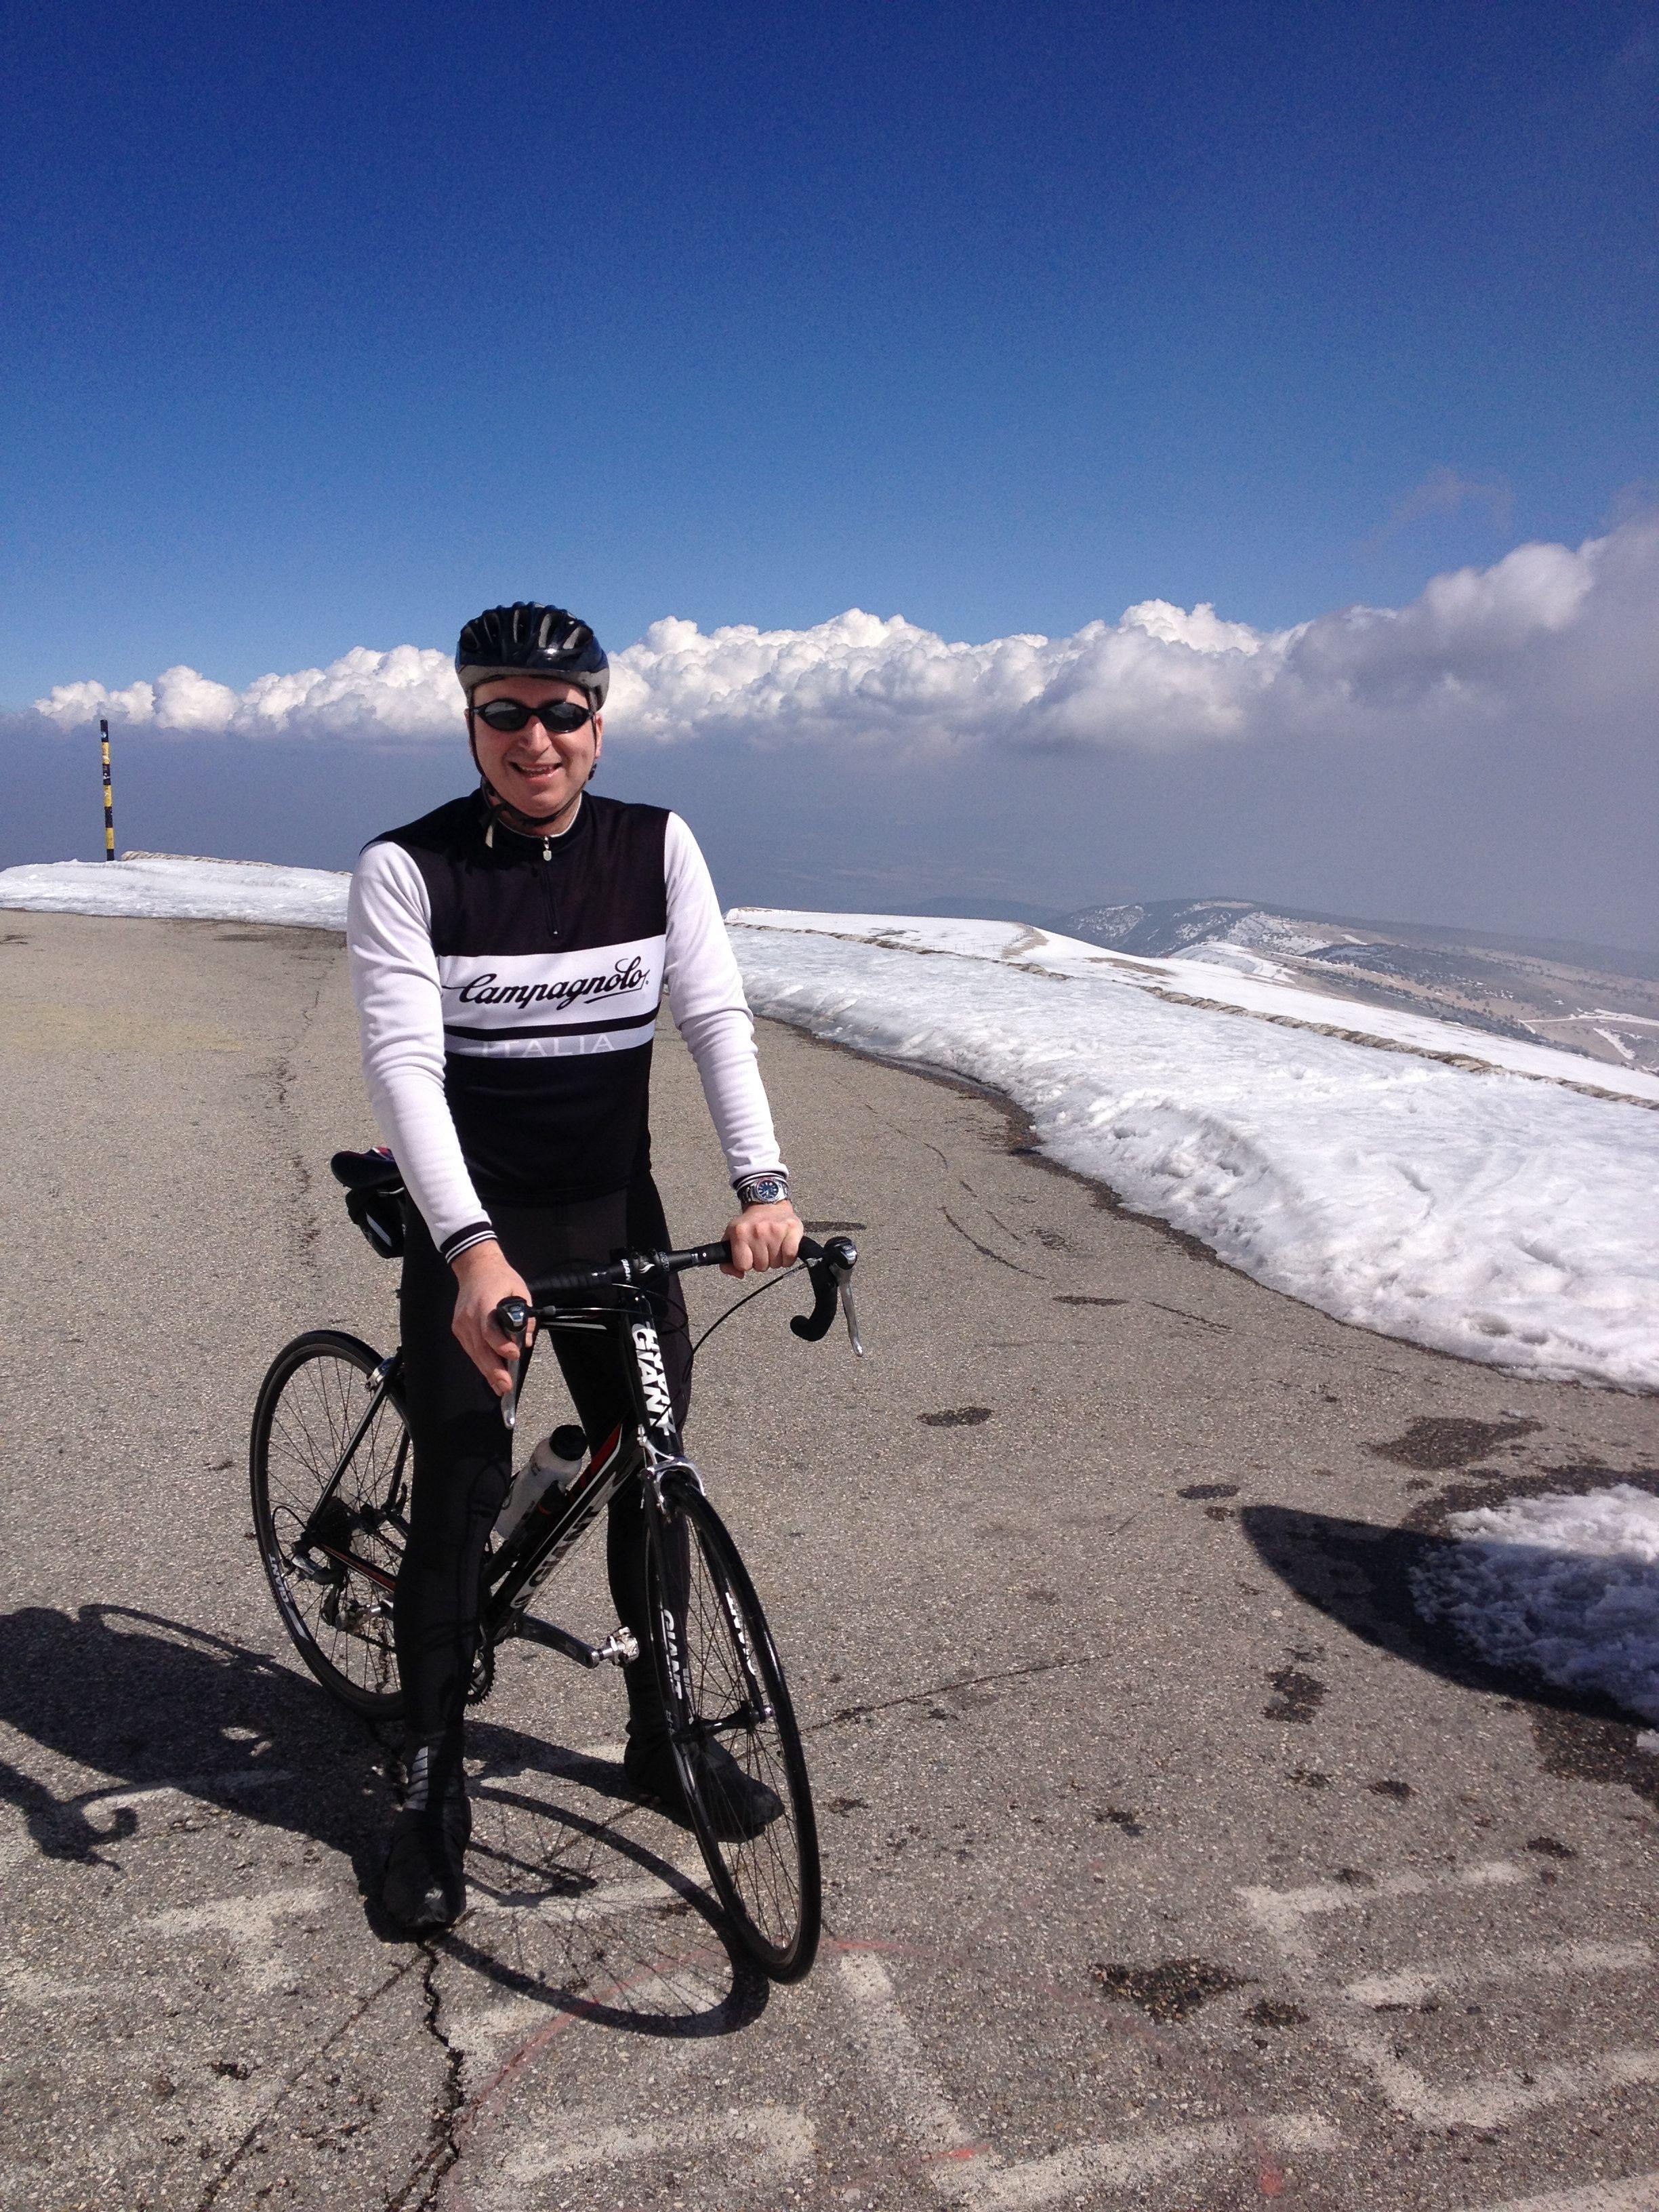 Mt Ventoux summit - made it!